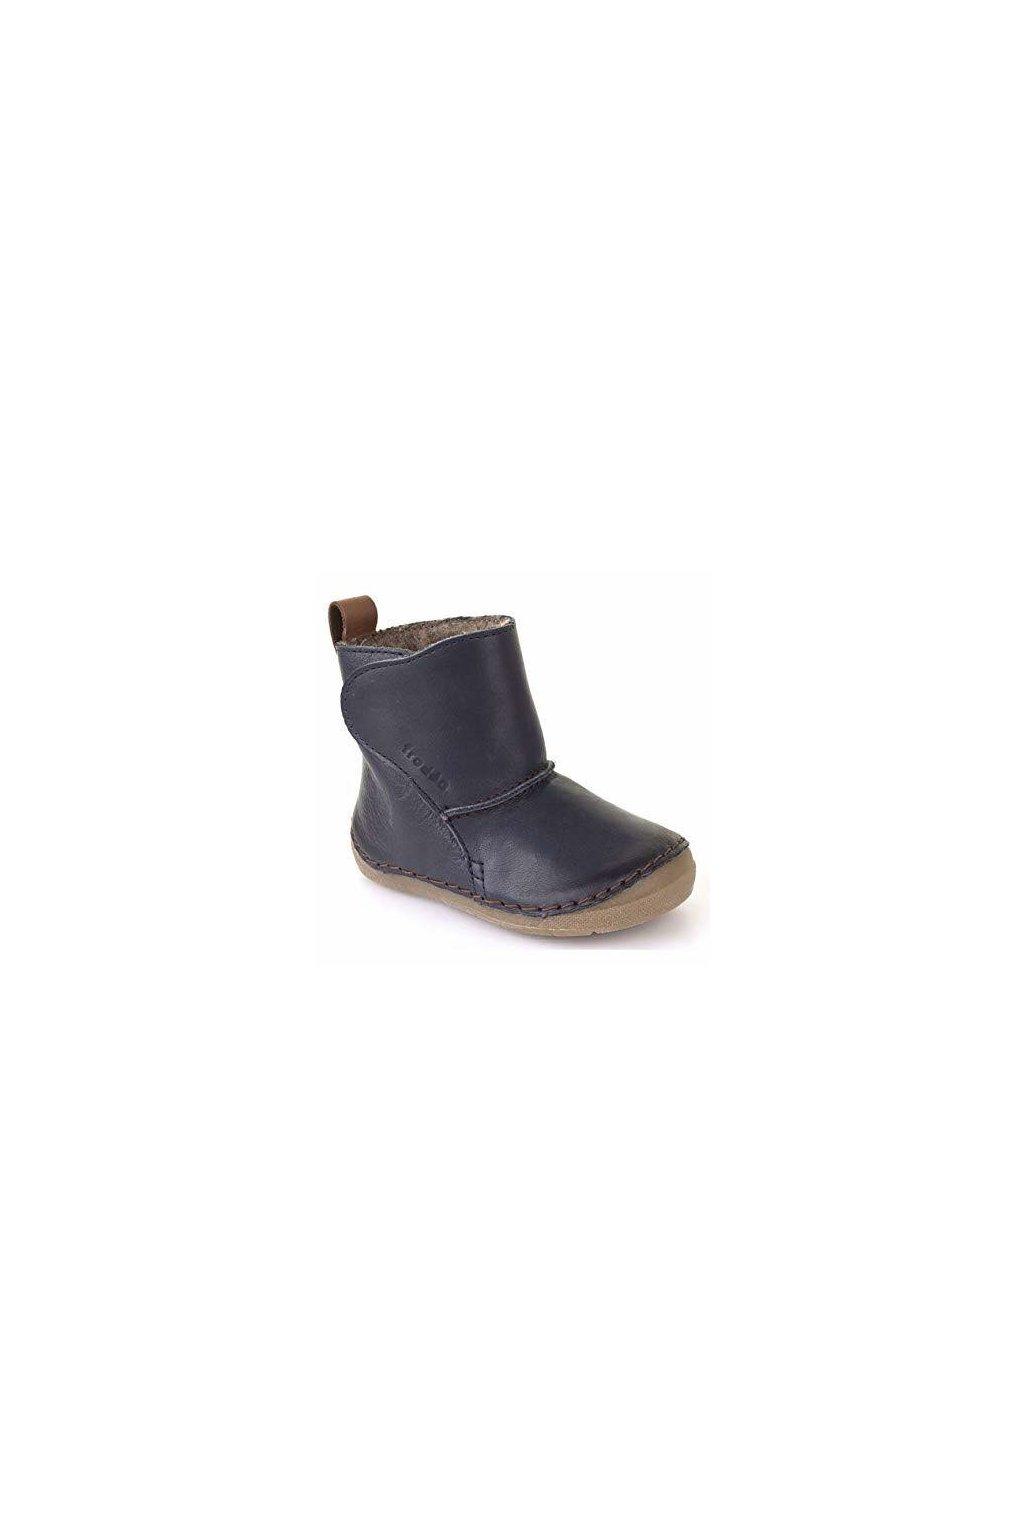 Froddo Boots Dark Blue - Jahňacia Kožušina